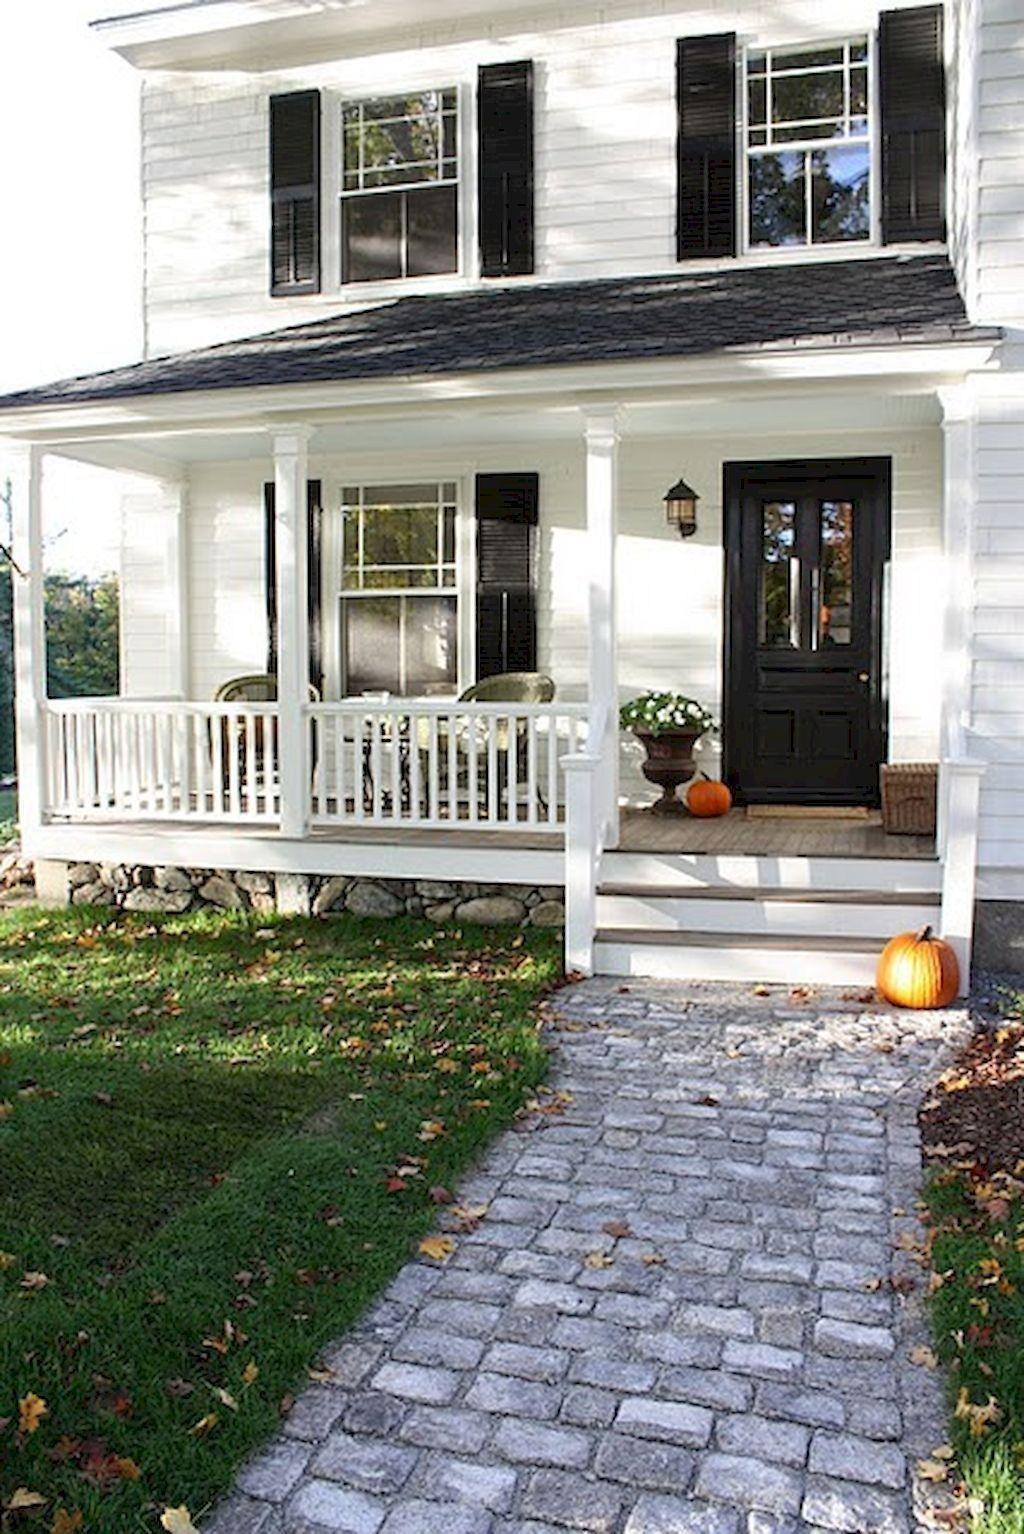 48 easy farmhouse front porch decor design ideas modern on beautiful modern farmhouse trending exterior design ideas id=75102